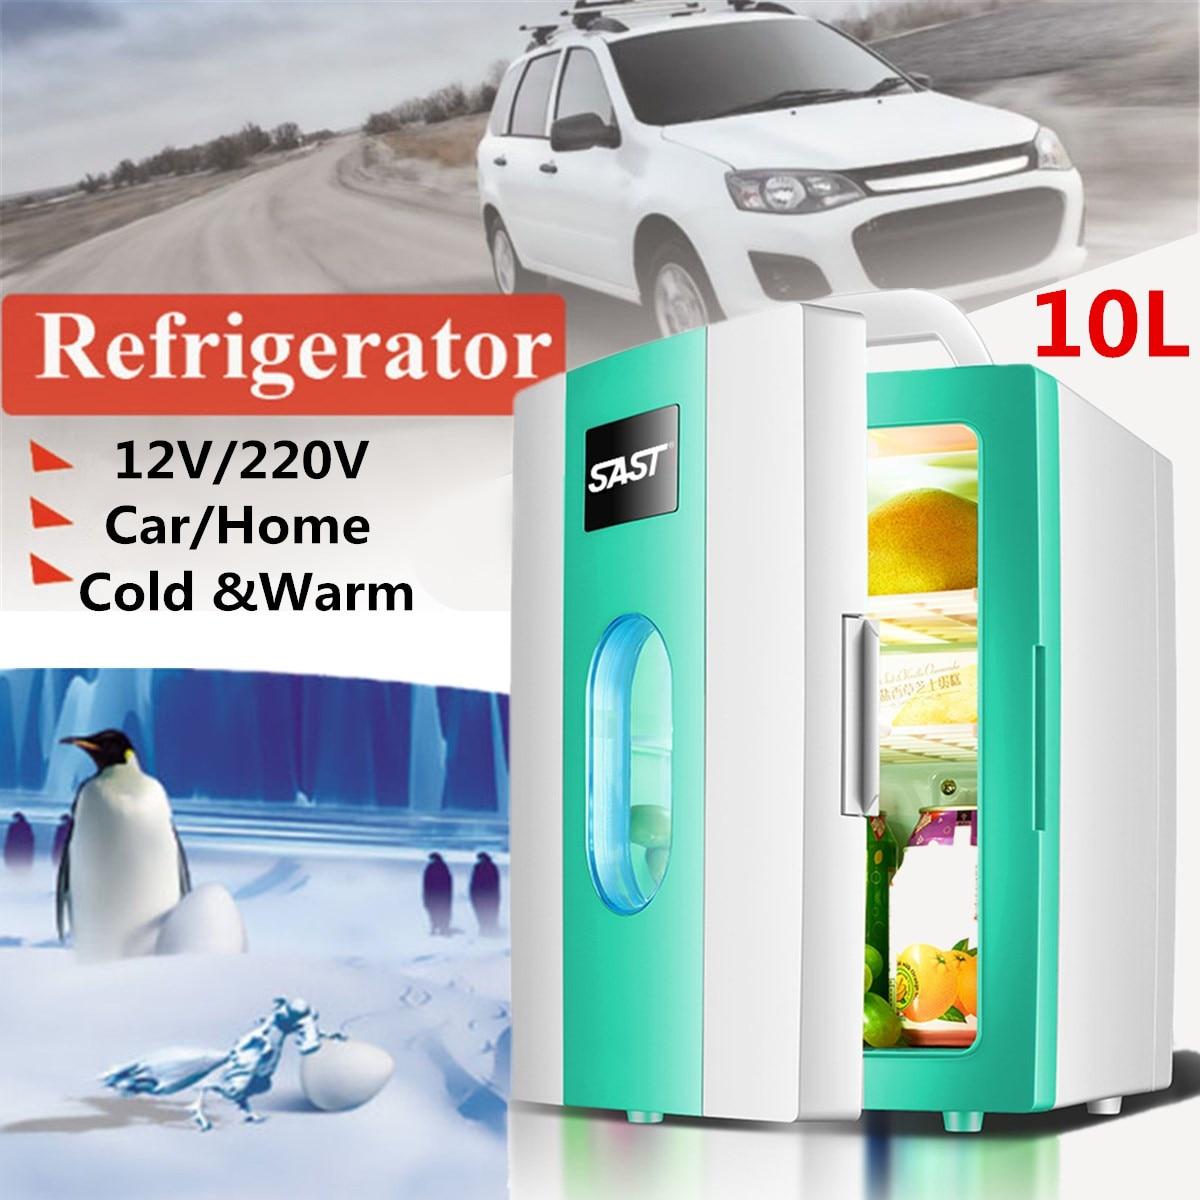 10L Portable Mini Refrigerator 12V/220V Car Camping Home Fridge Cooler/Warmer Portable Handle Low Noise Freezer Refrigerator